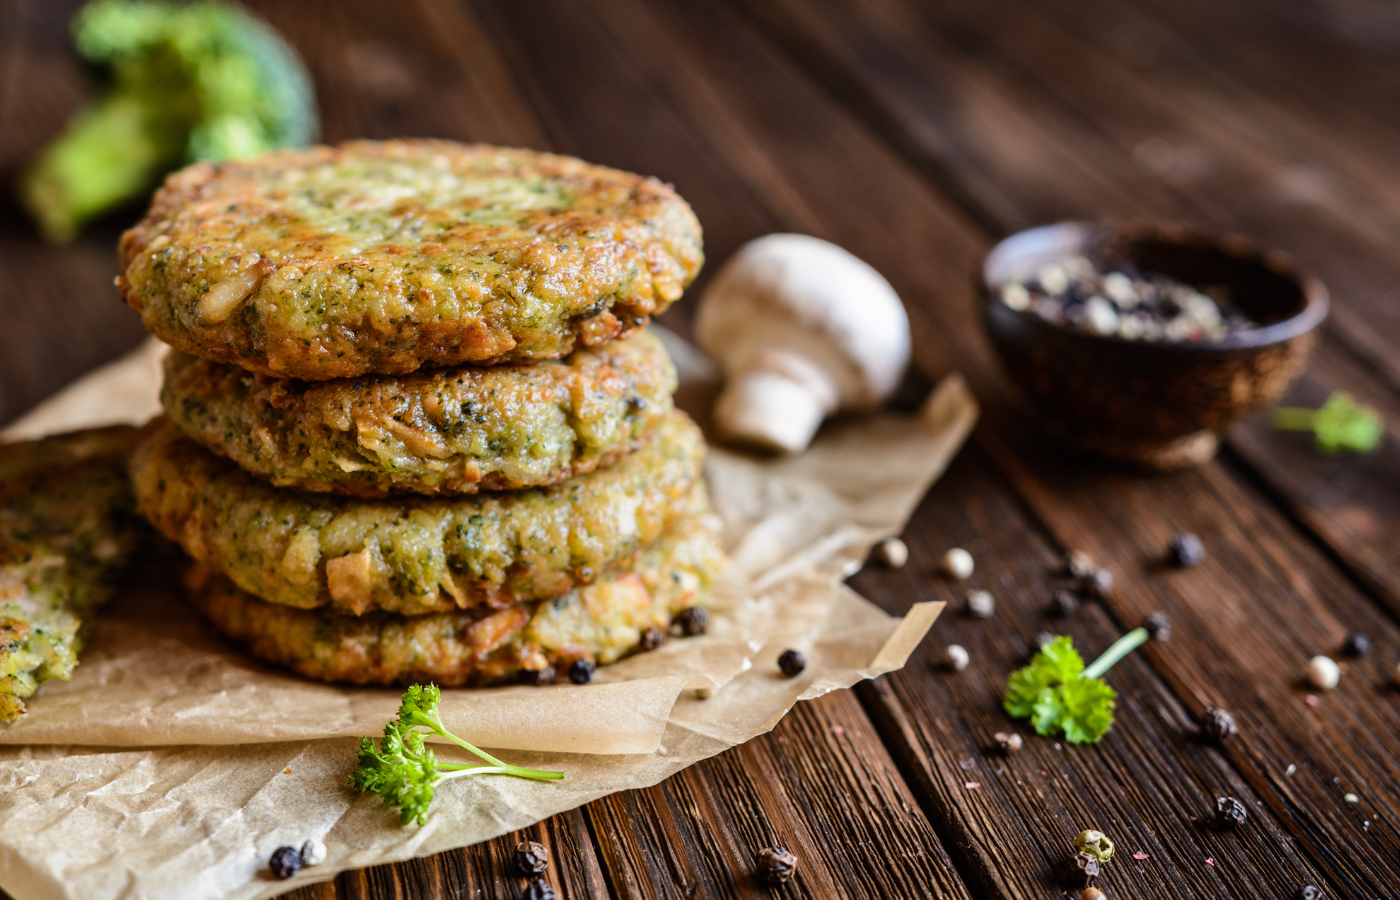 receitas imperdiveis de hamburgueres vegetarianos